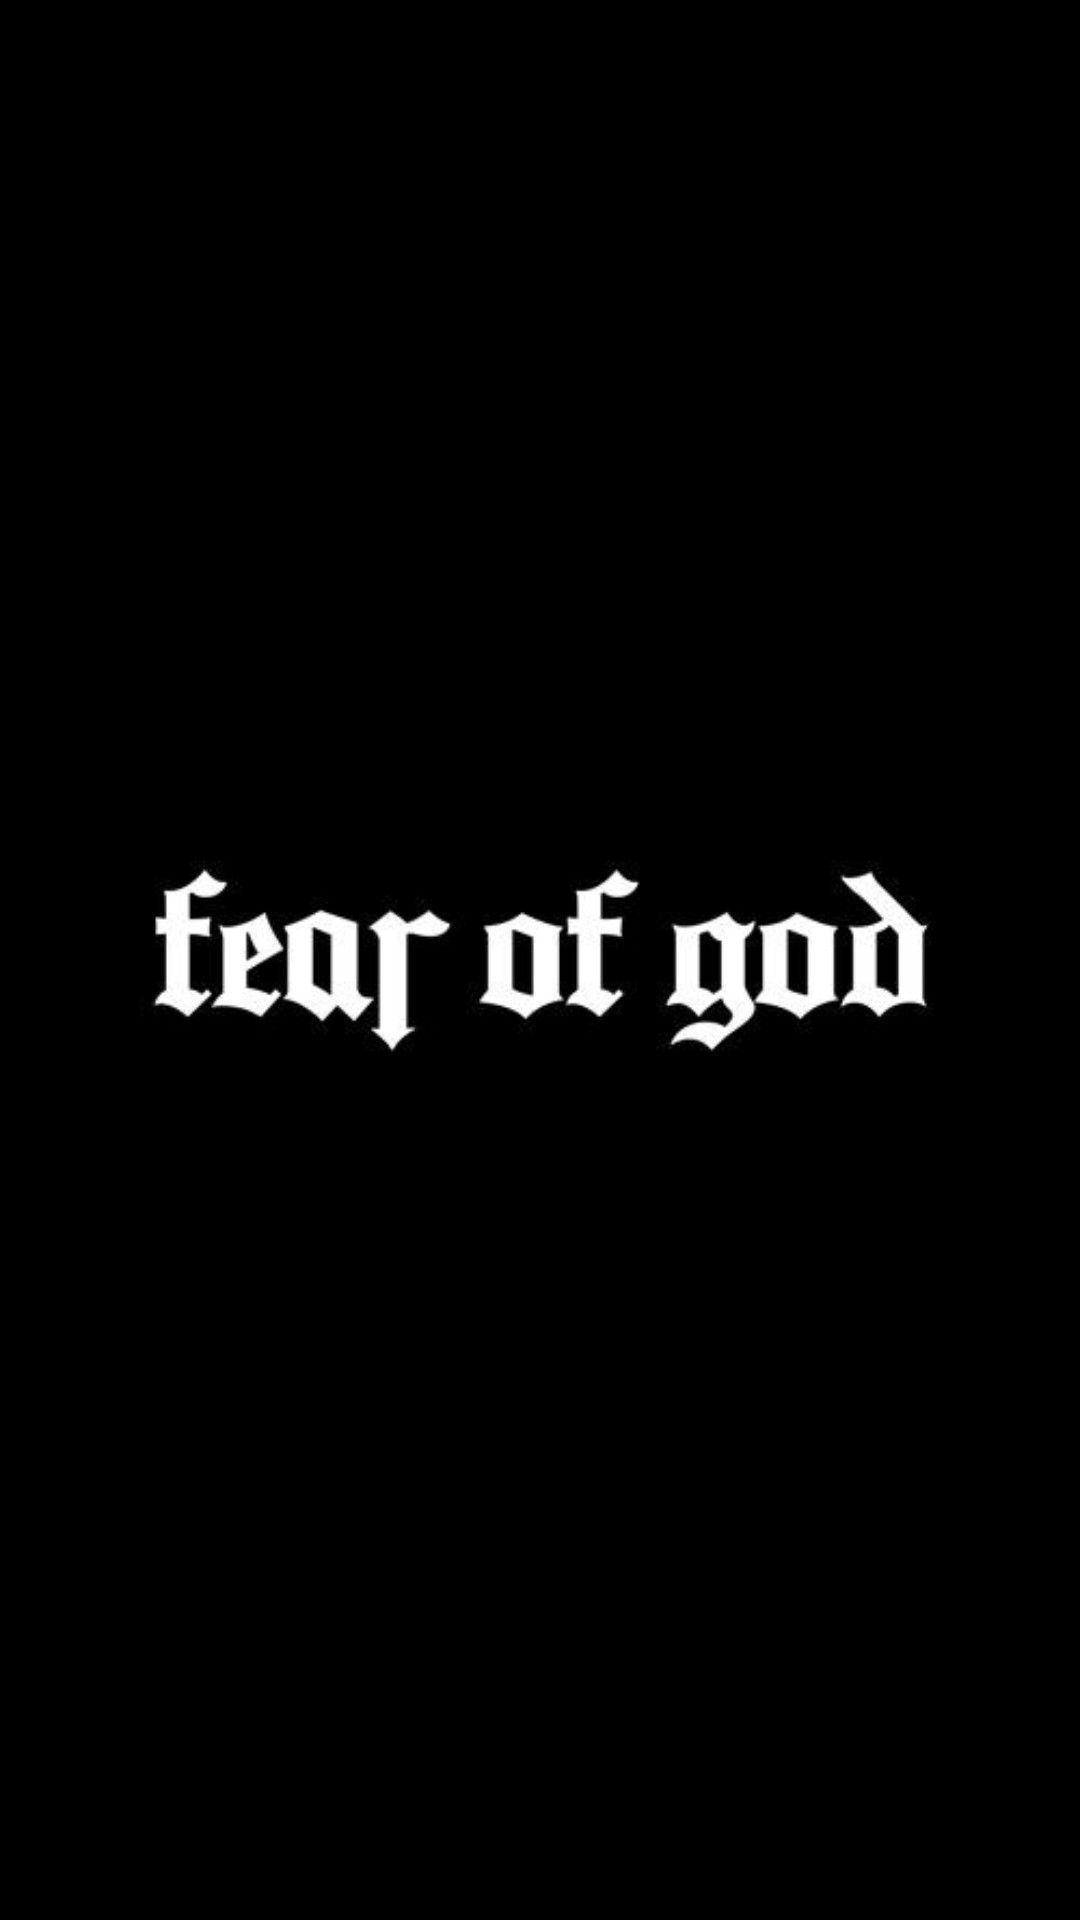 don't fear me. killed God. Now I'm God. Fear death,. not me.#death #dont #fear #god #killed